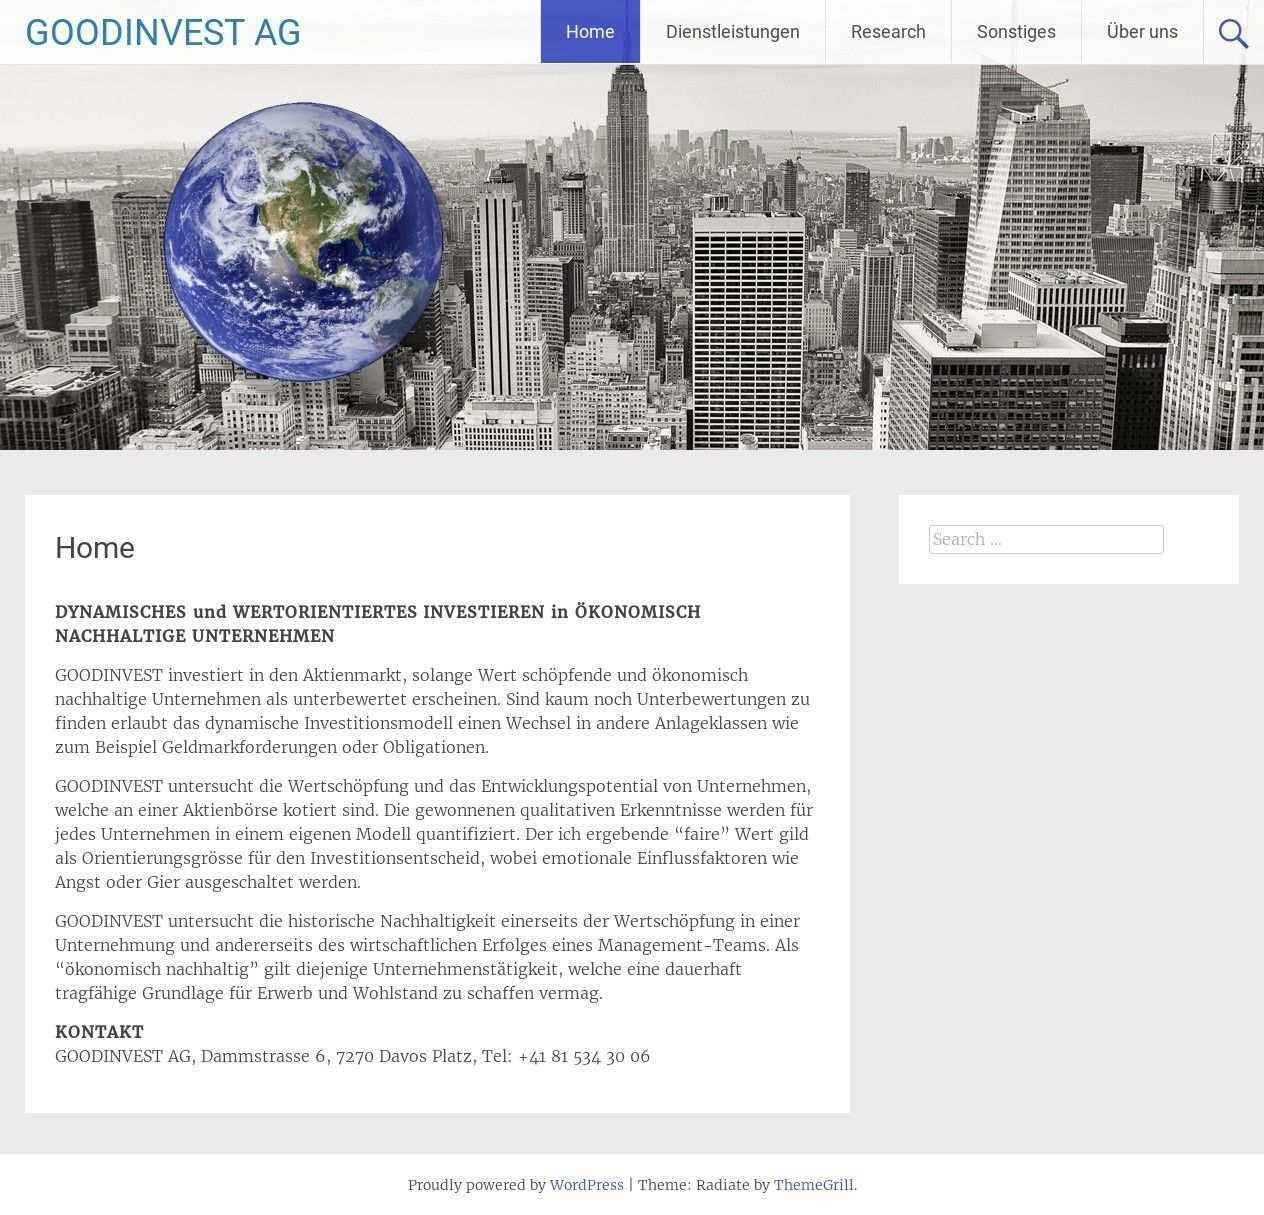 Template Wordpress Radiate By Themegrill Goodinvest Com Wordpress Template Wordpress Wordpress Theme